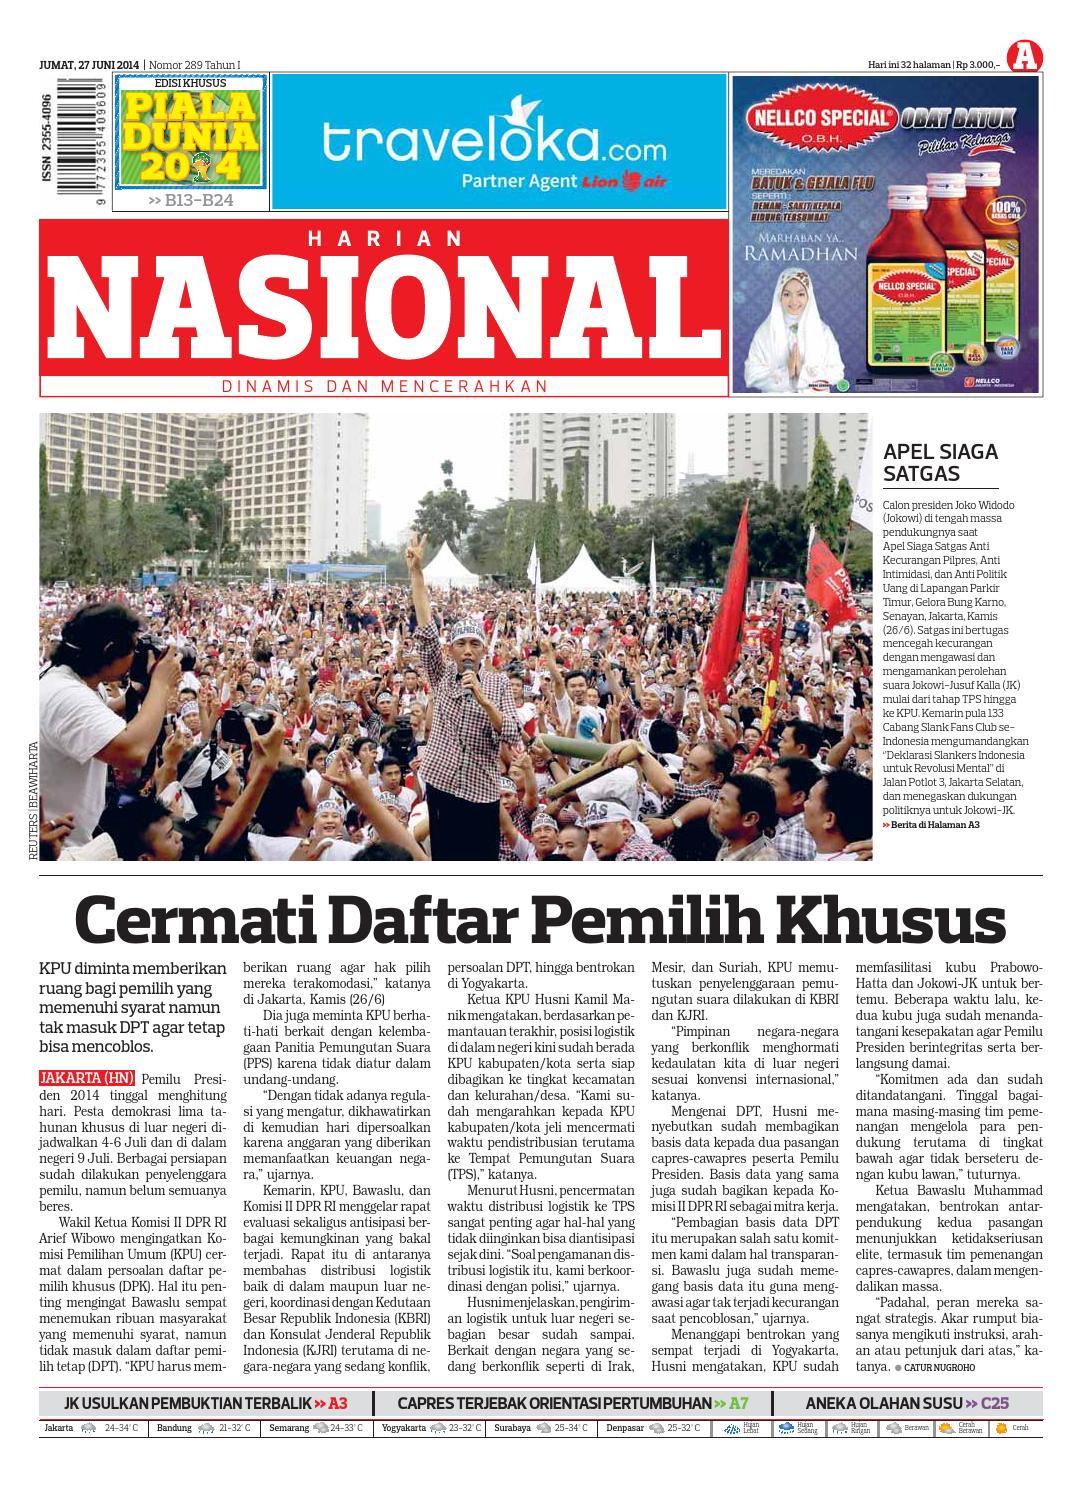 Harian Nasional By Harian Nasional Issuu